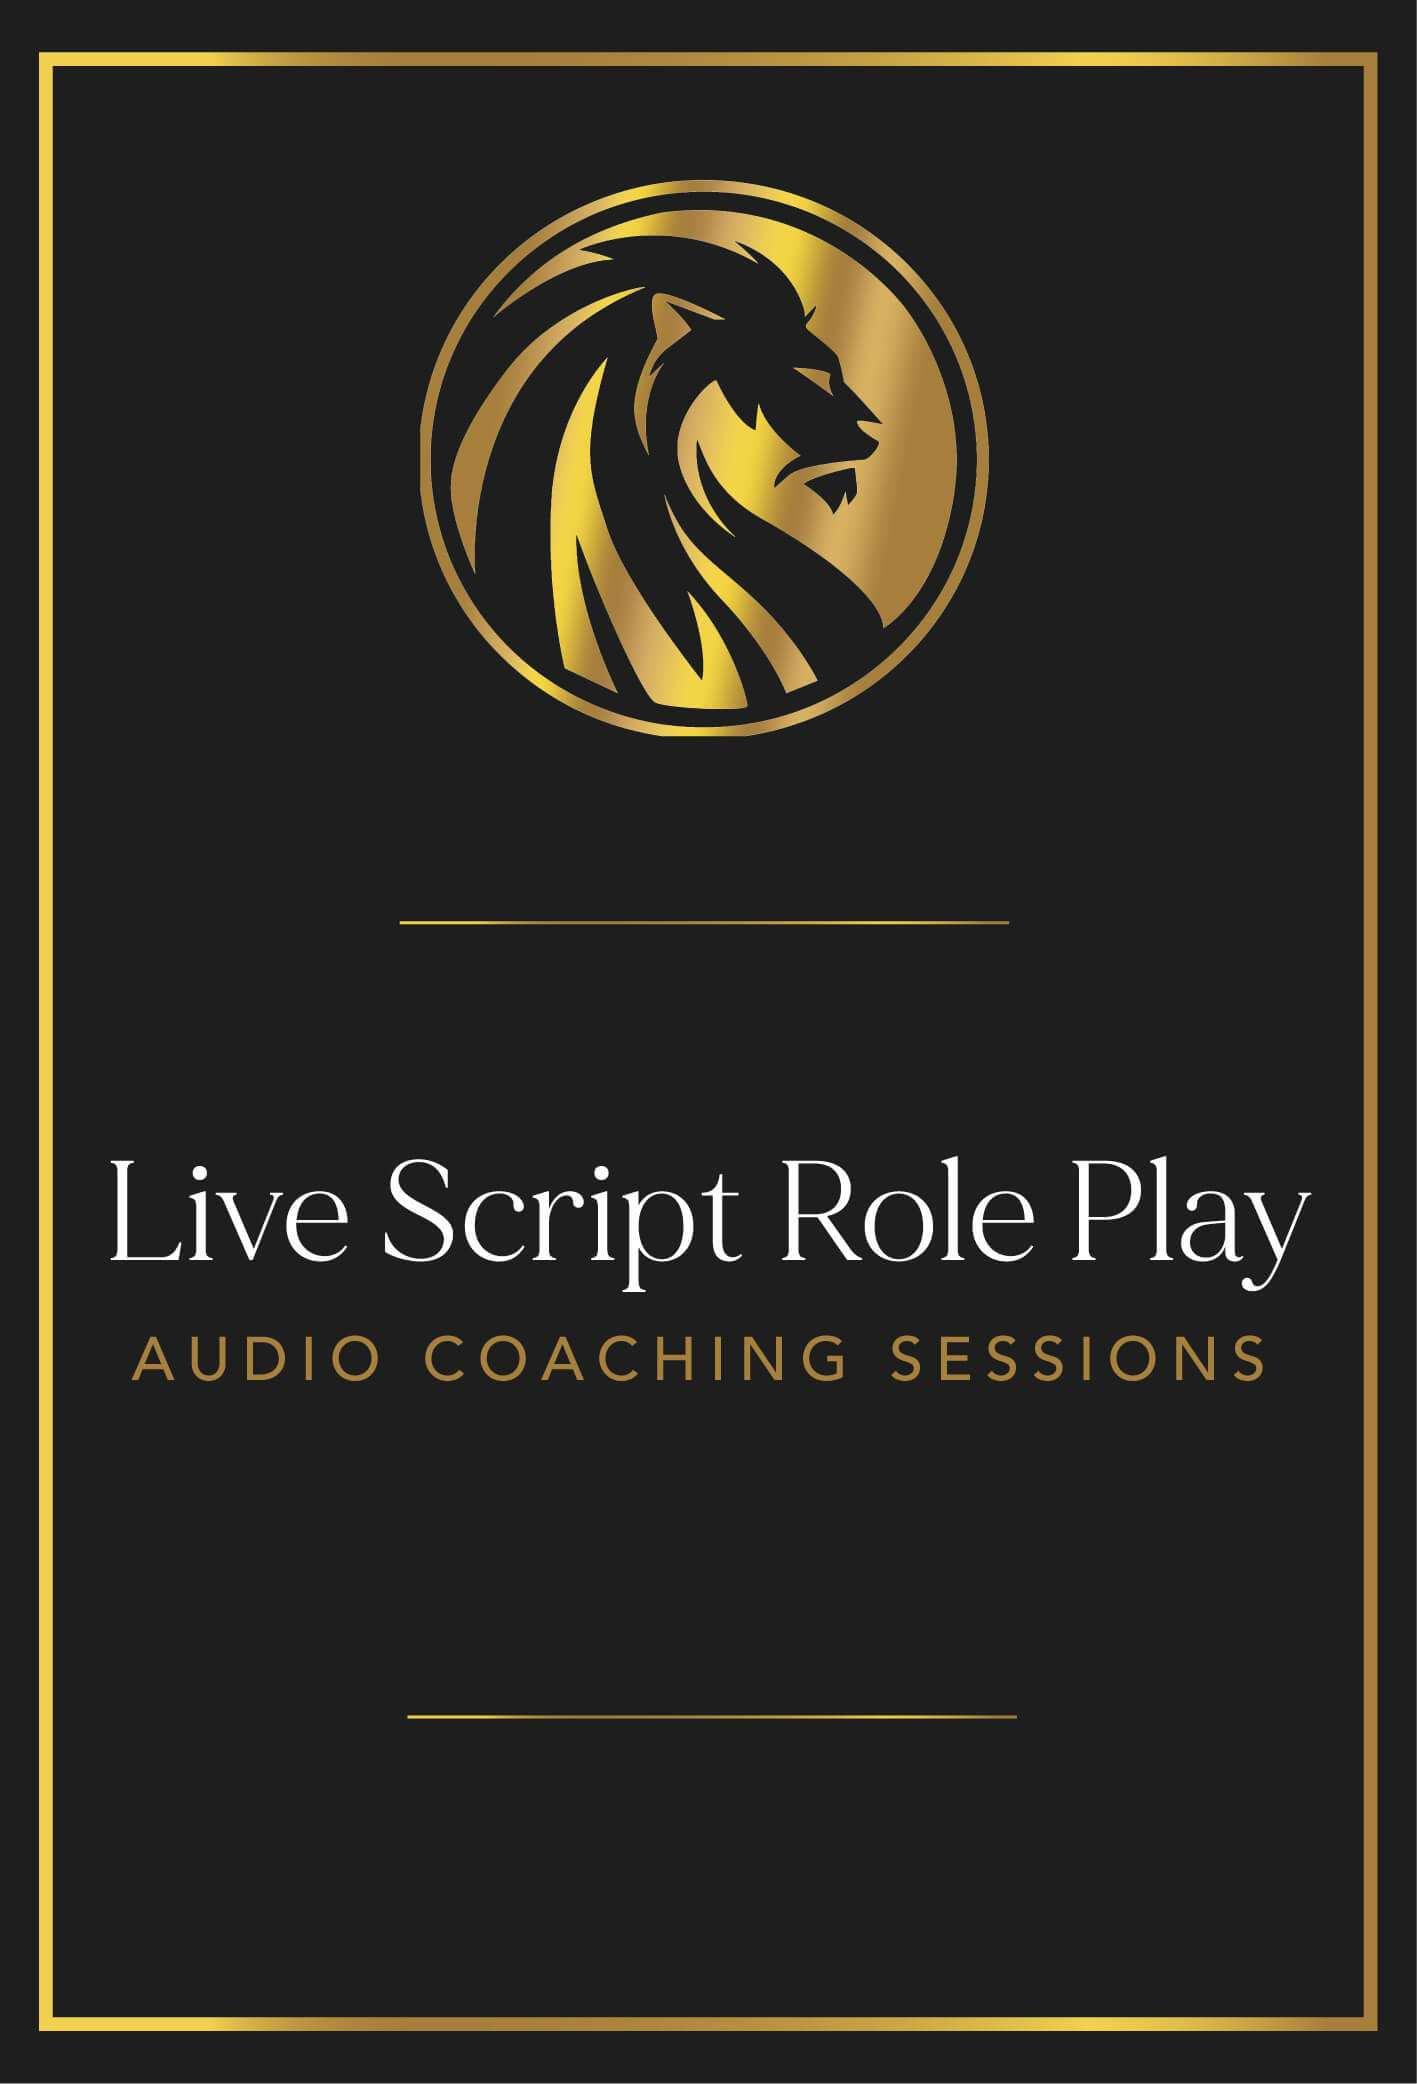 Live Script Role Play